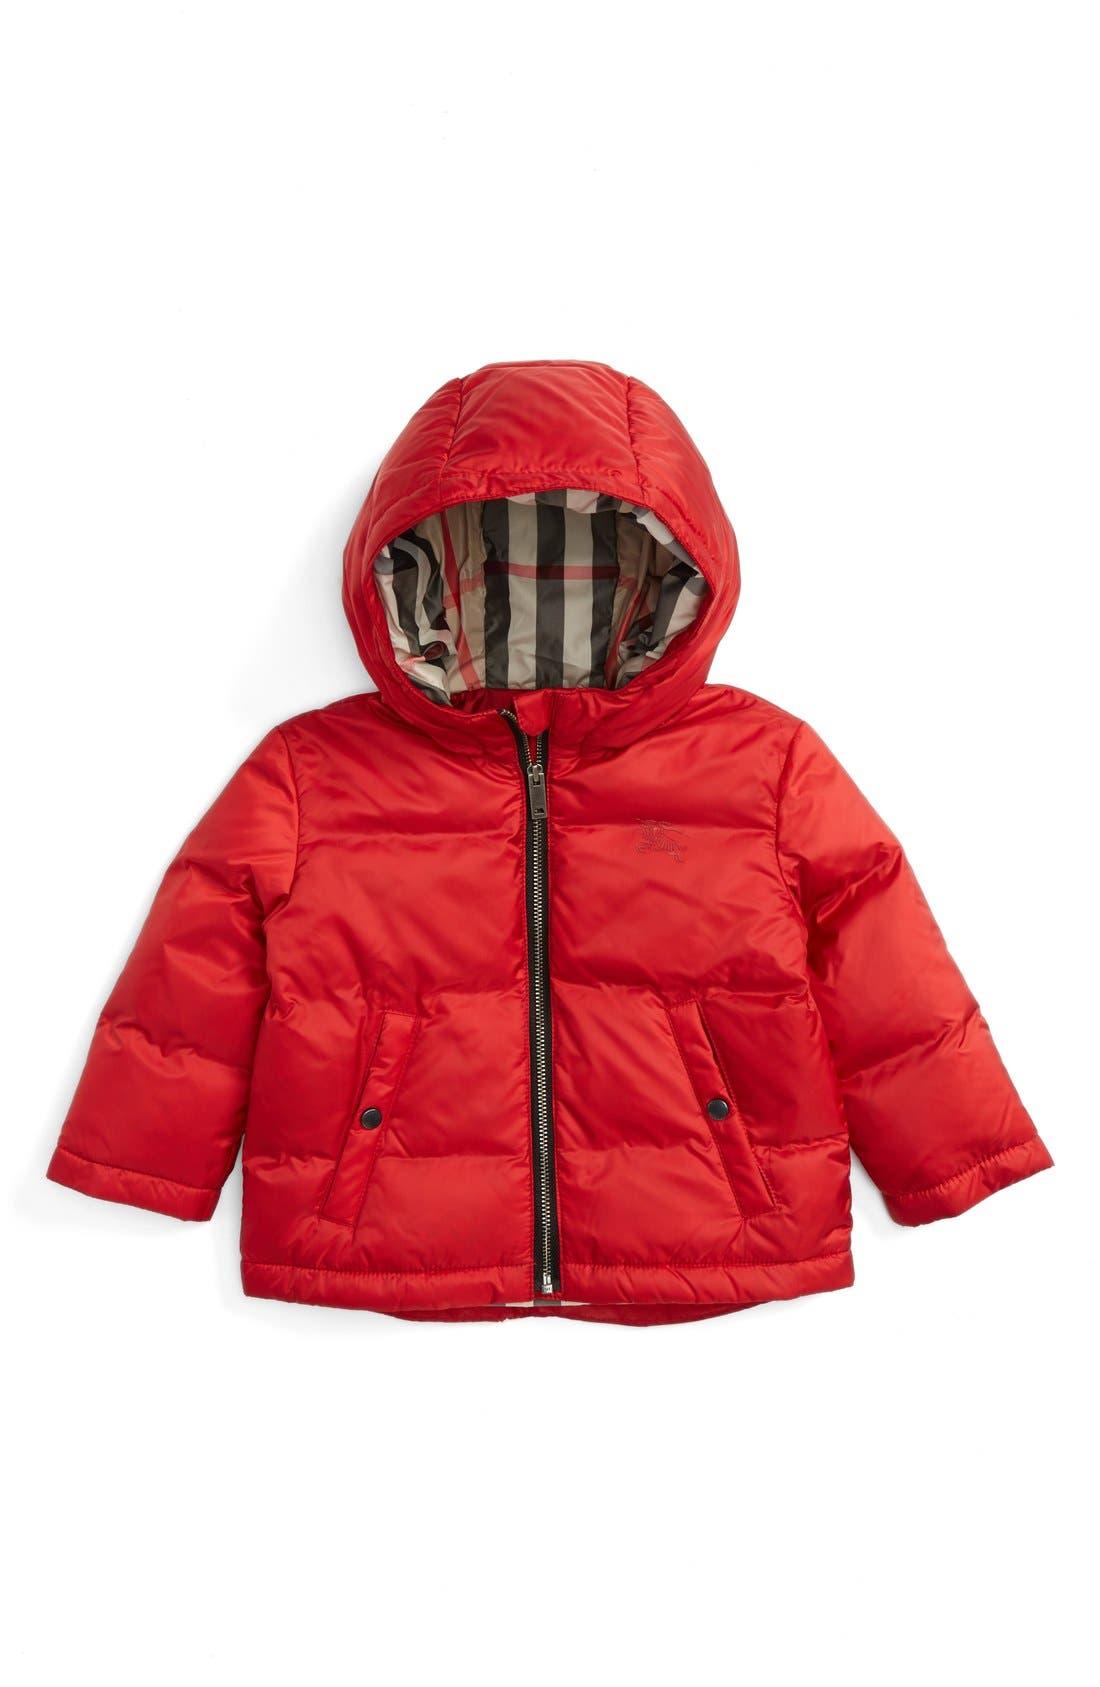 Main Image - Burberry Rio Hooded Puffer Jacket (Baby Girls)